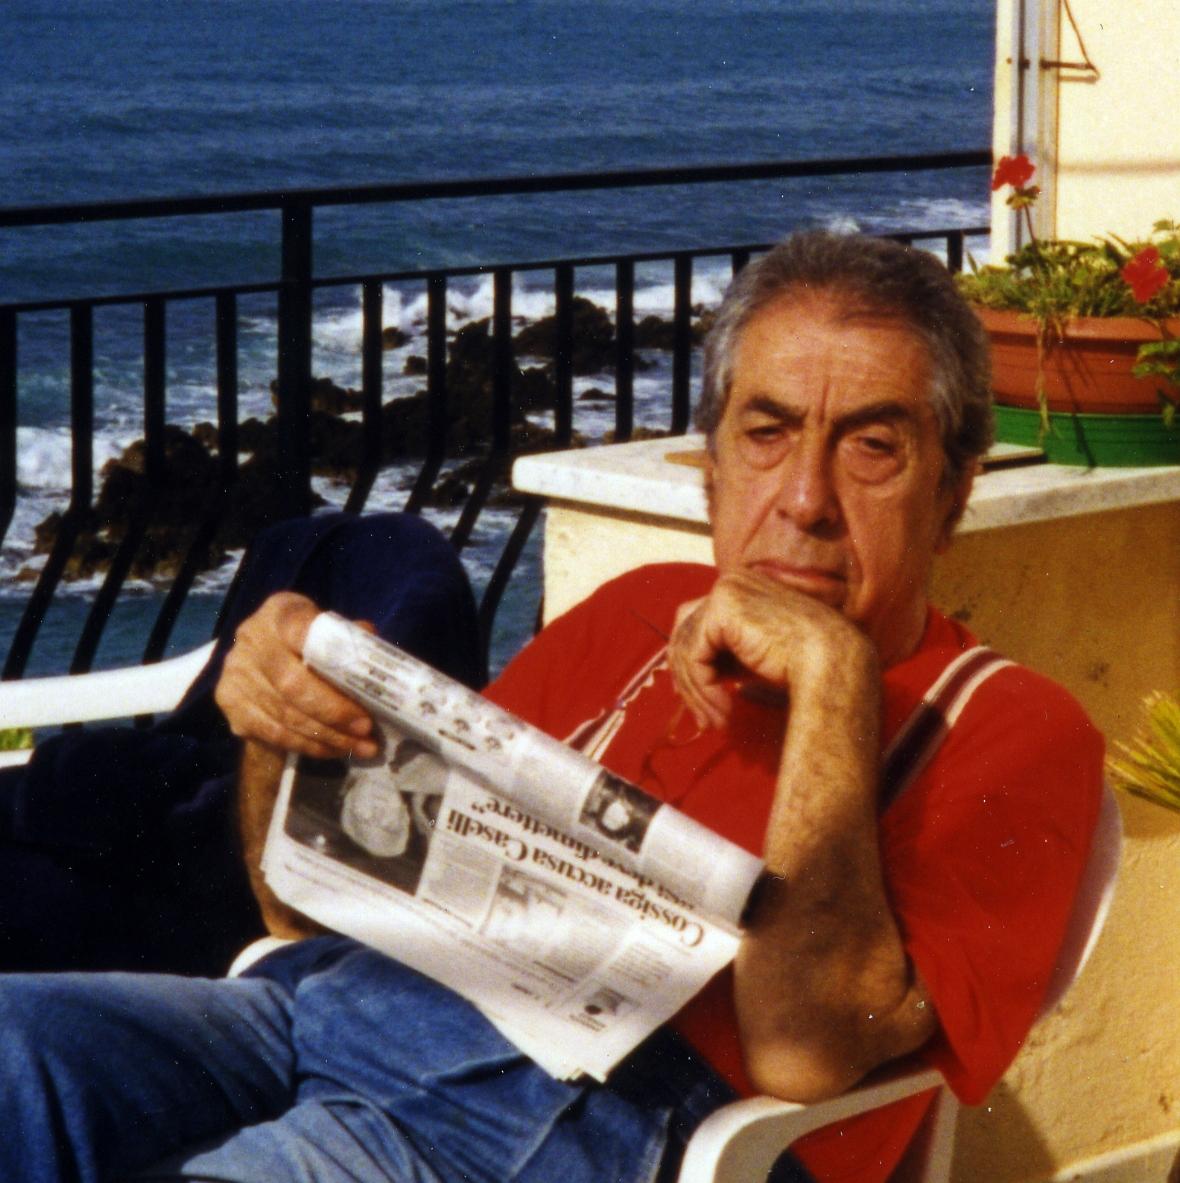 Image of Caio Mario Garrubba from Wikidata